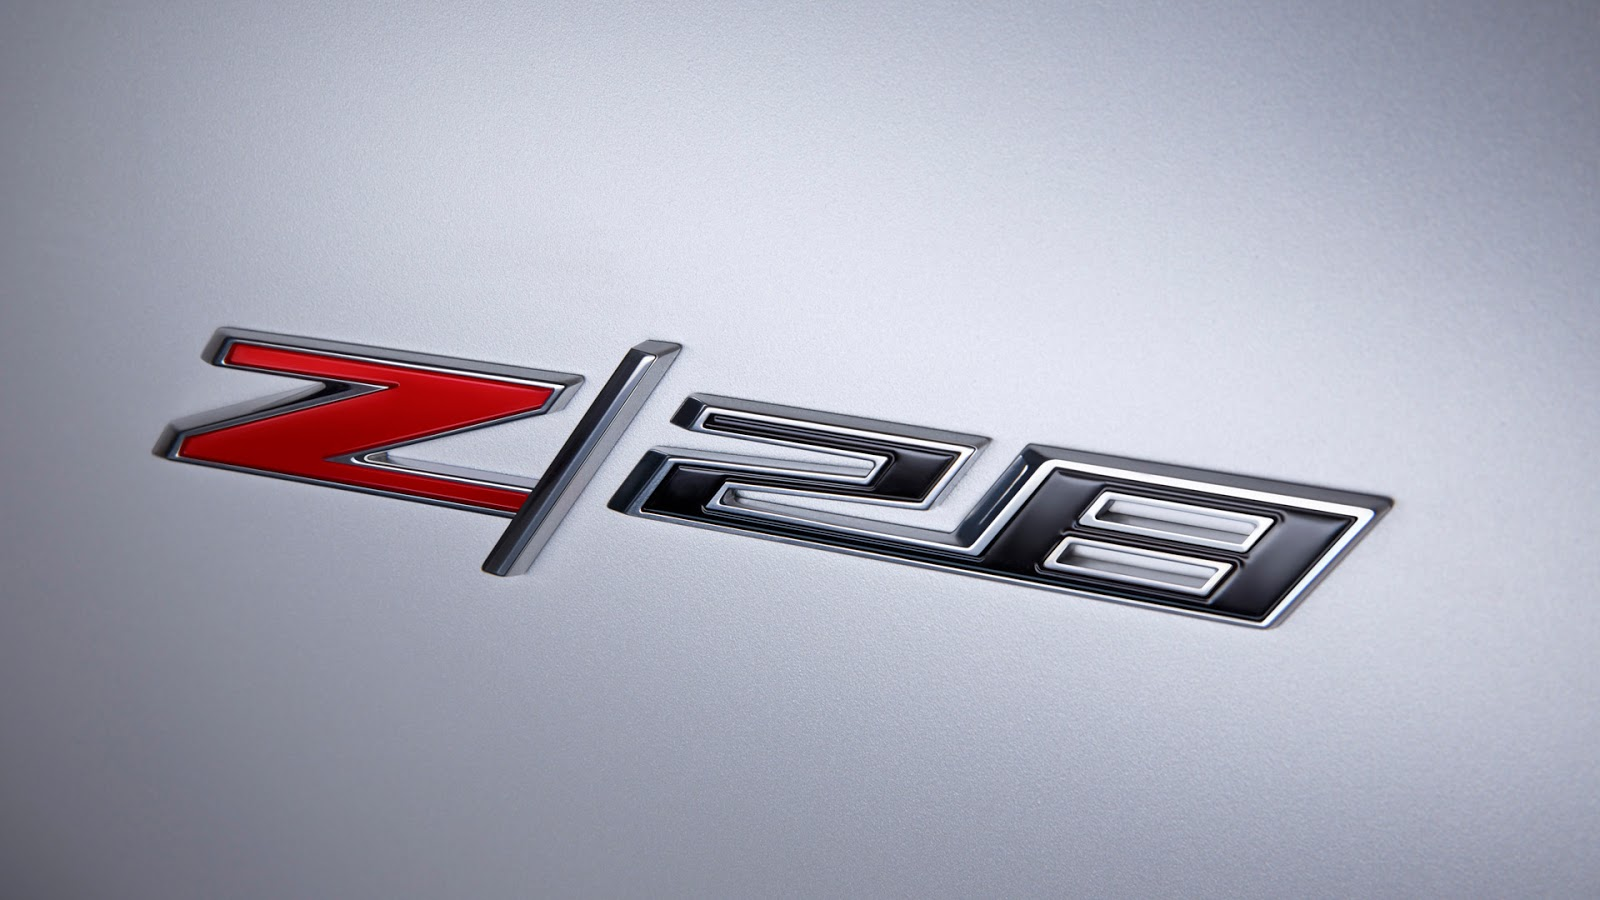 2014 Chevrolet Camaro Z/28 427 on 19 7.0 V8 LS7 507 cv 65 mkgf  #BC0D14